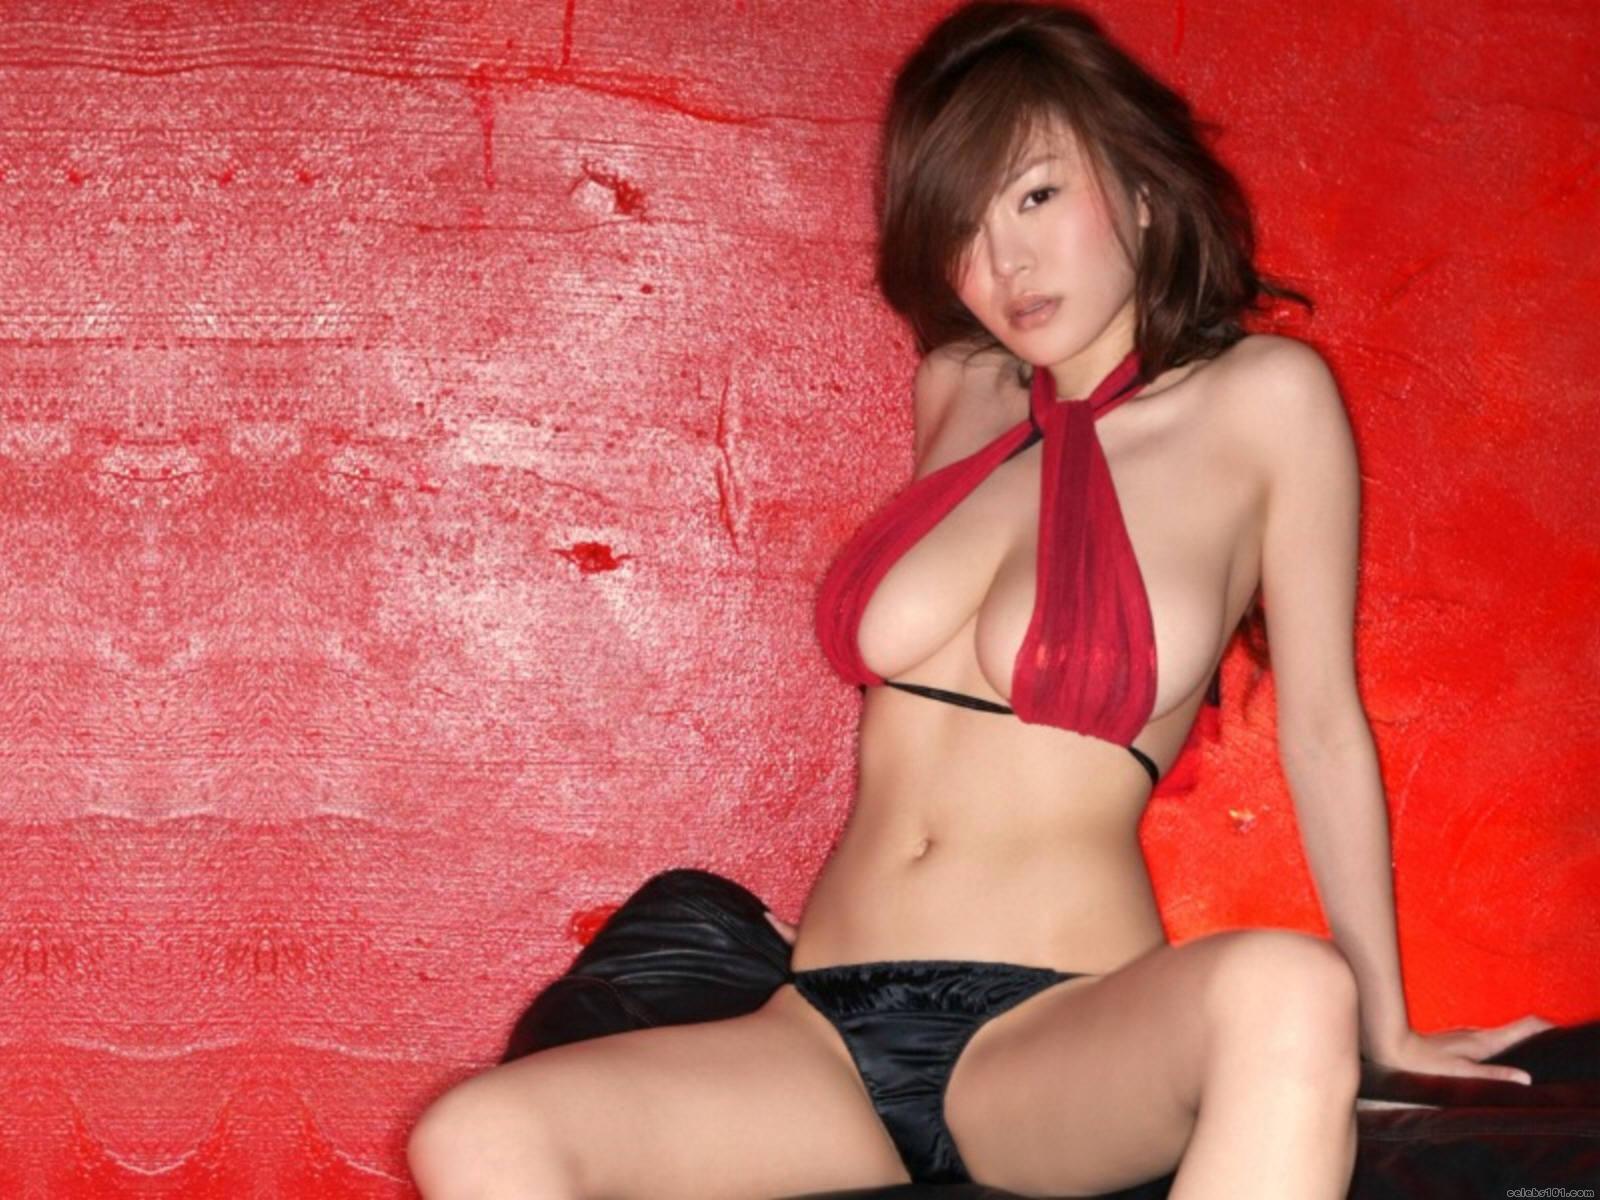 http://www.celebs101.com/wallpapers/Yoko_Matsugane/148109/youko291600x1200.jpg